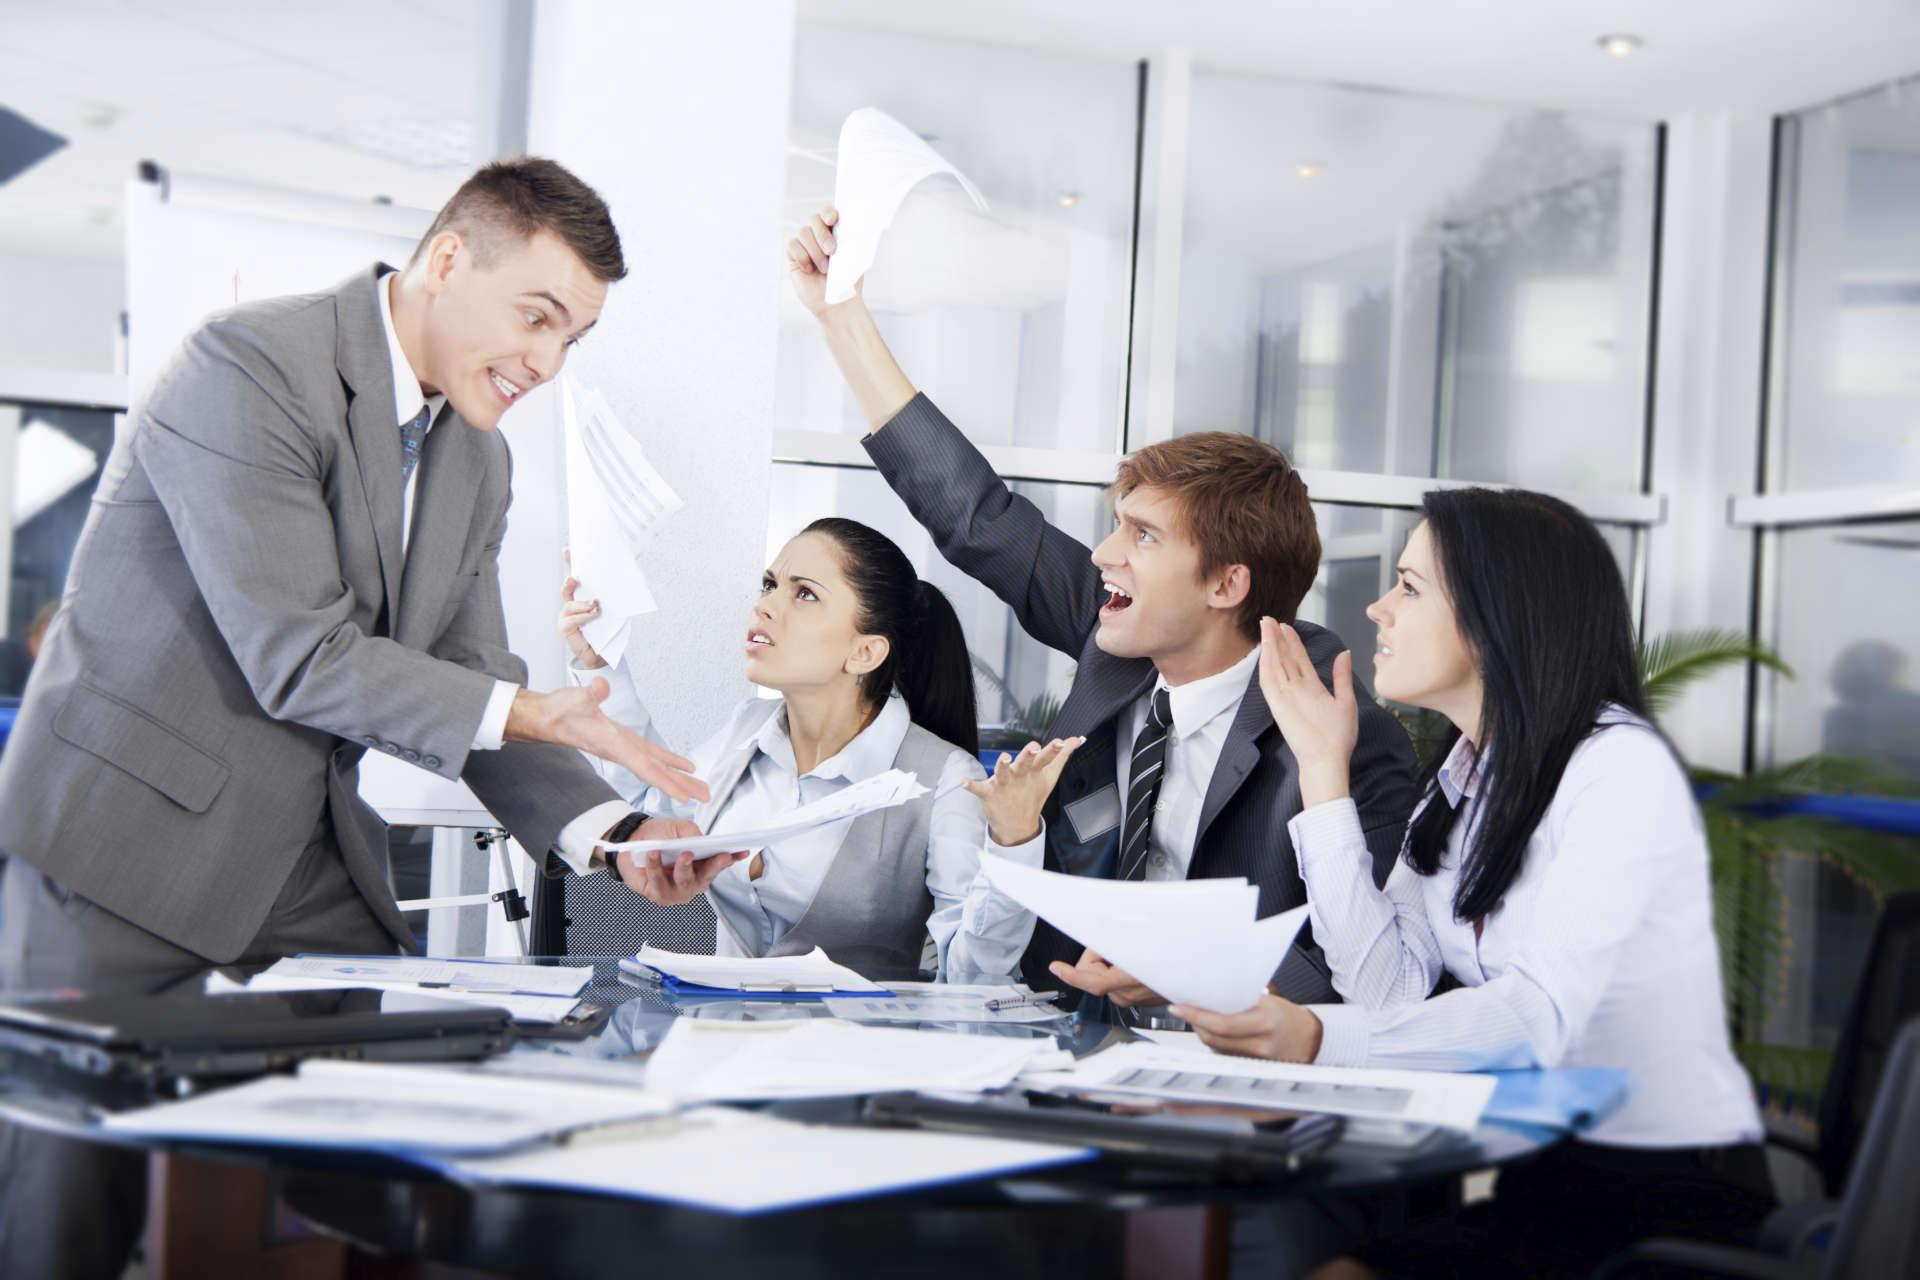 Negative Work Environment